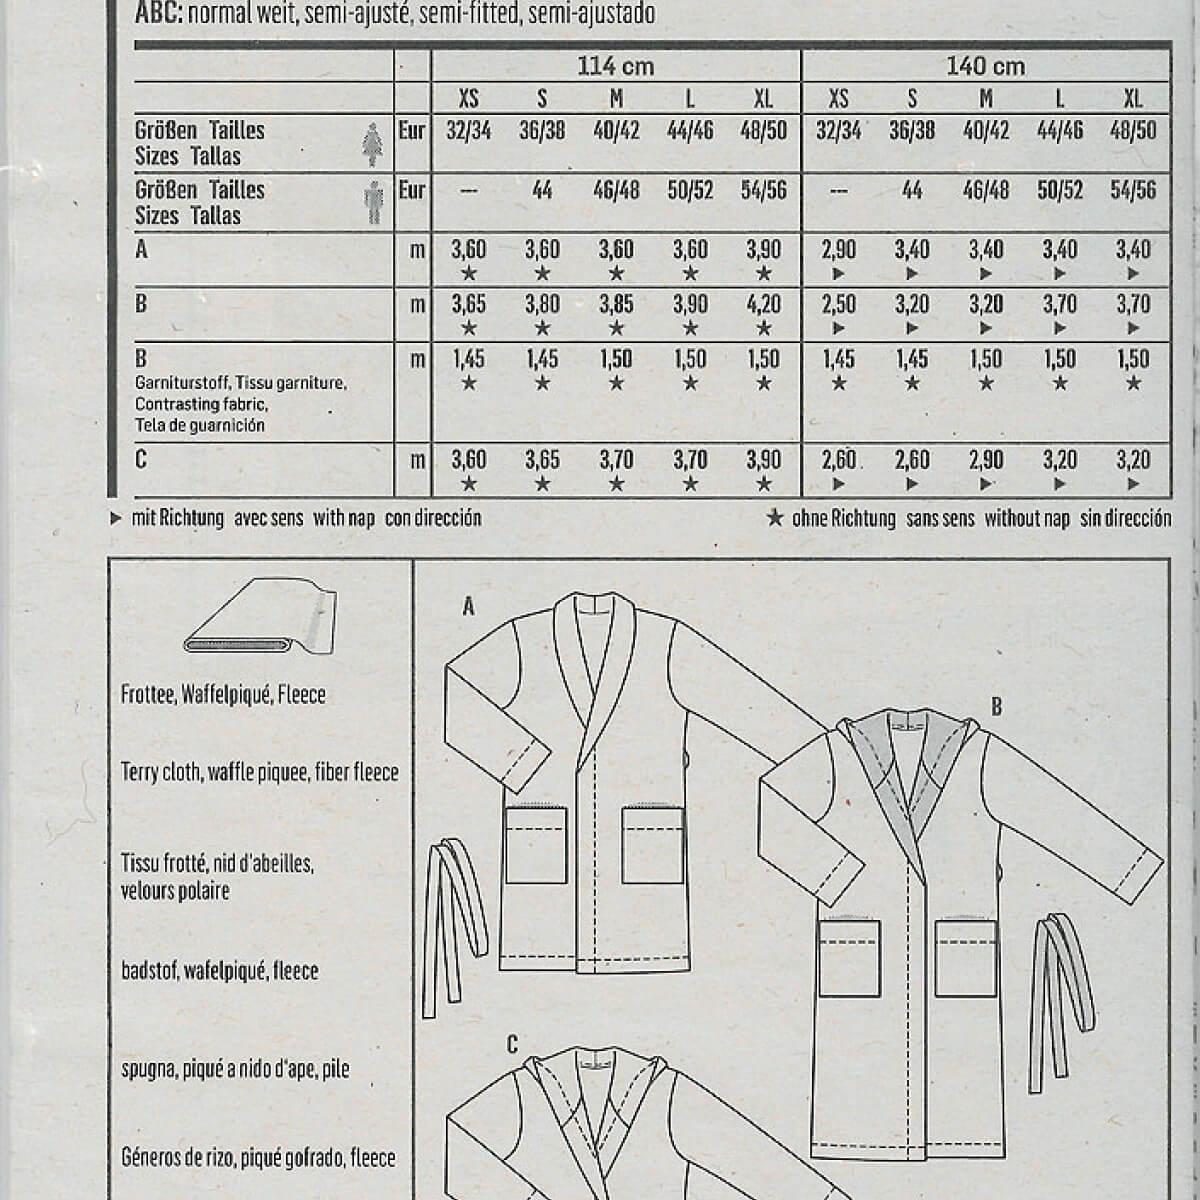 patron de peignoir femme homme burda 6740 mercerie car fil. Black Bedroom Furniture Sets. Home Design Ideas